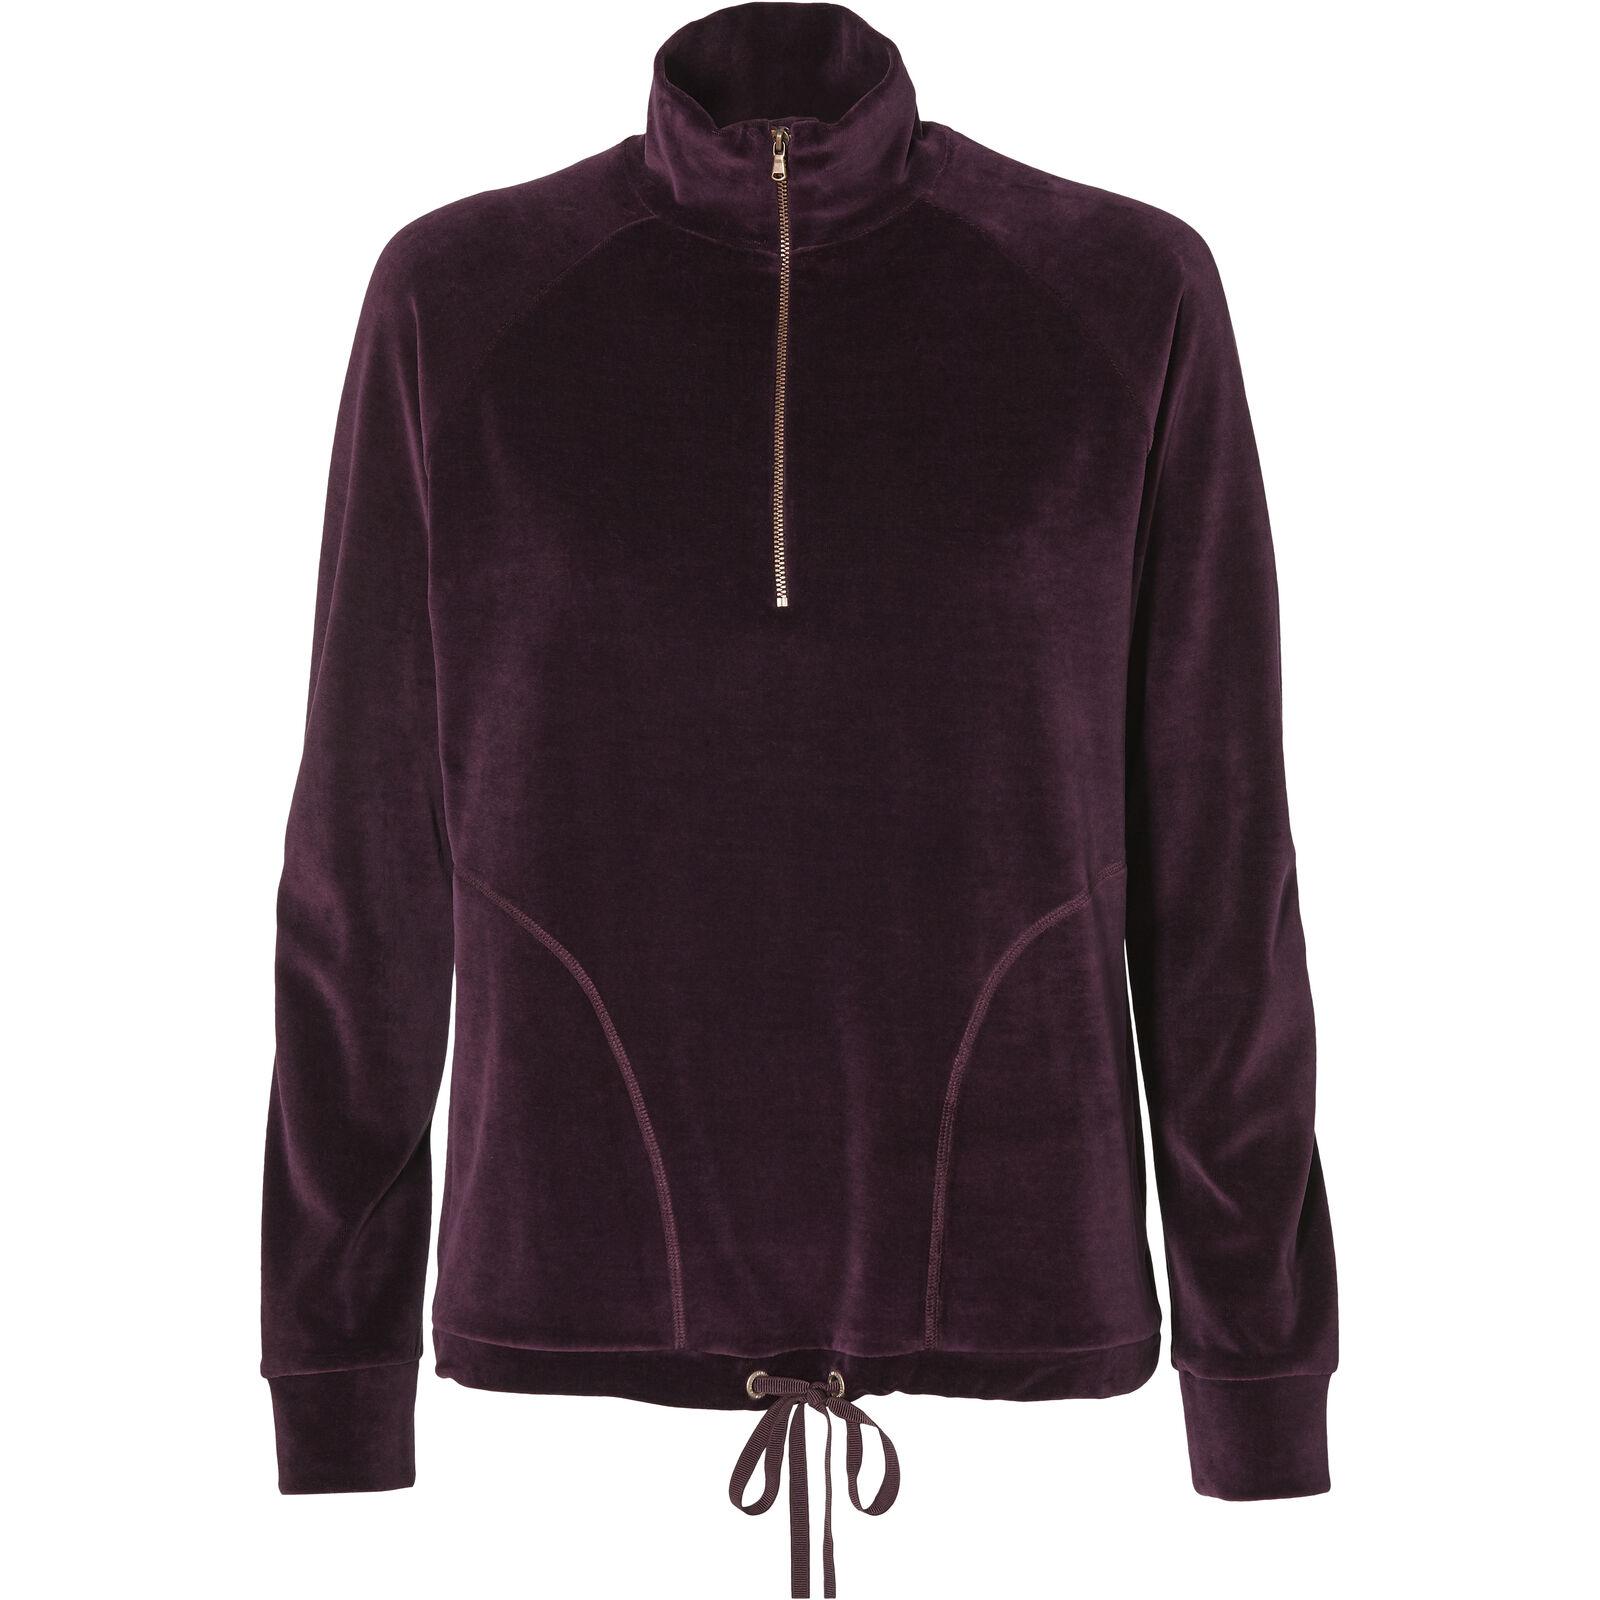 O'Neill Sweatshirt Sweater Premium Ess Crew Sweat purple Unifarben